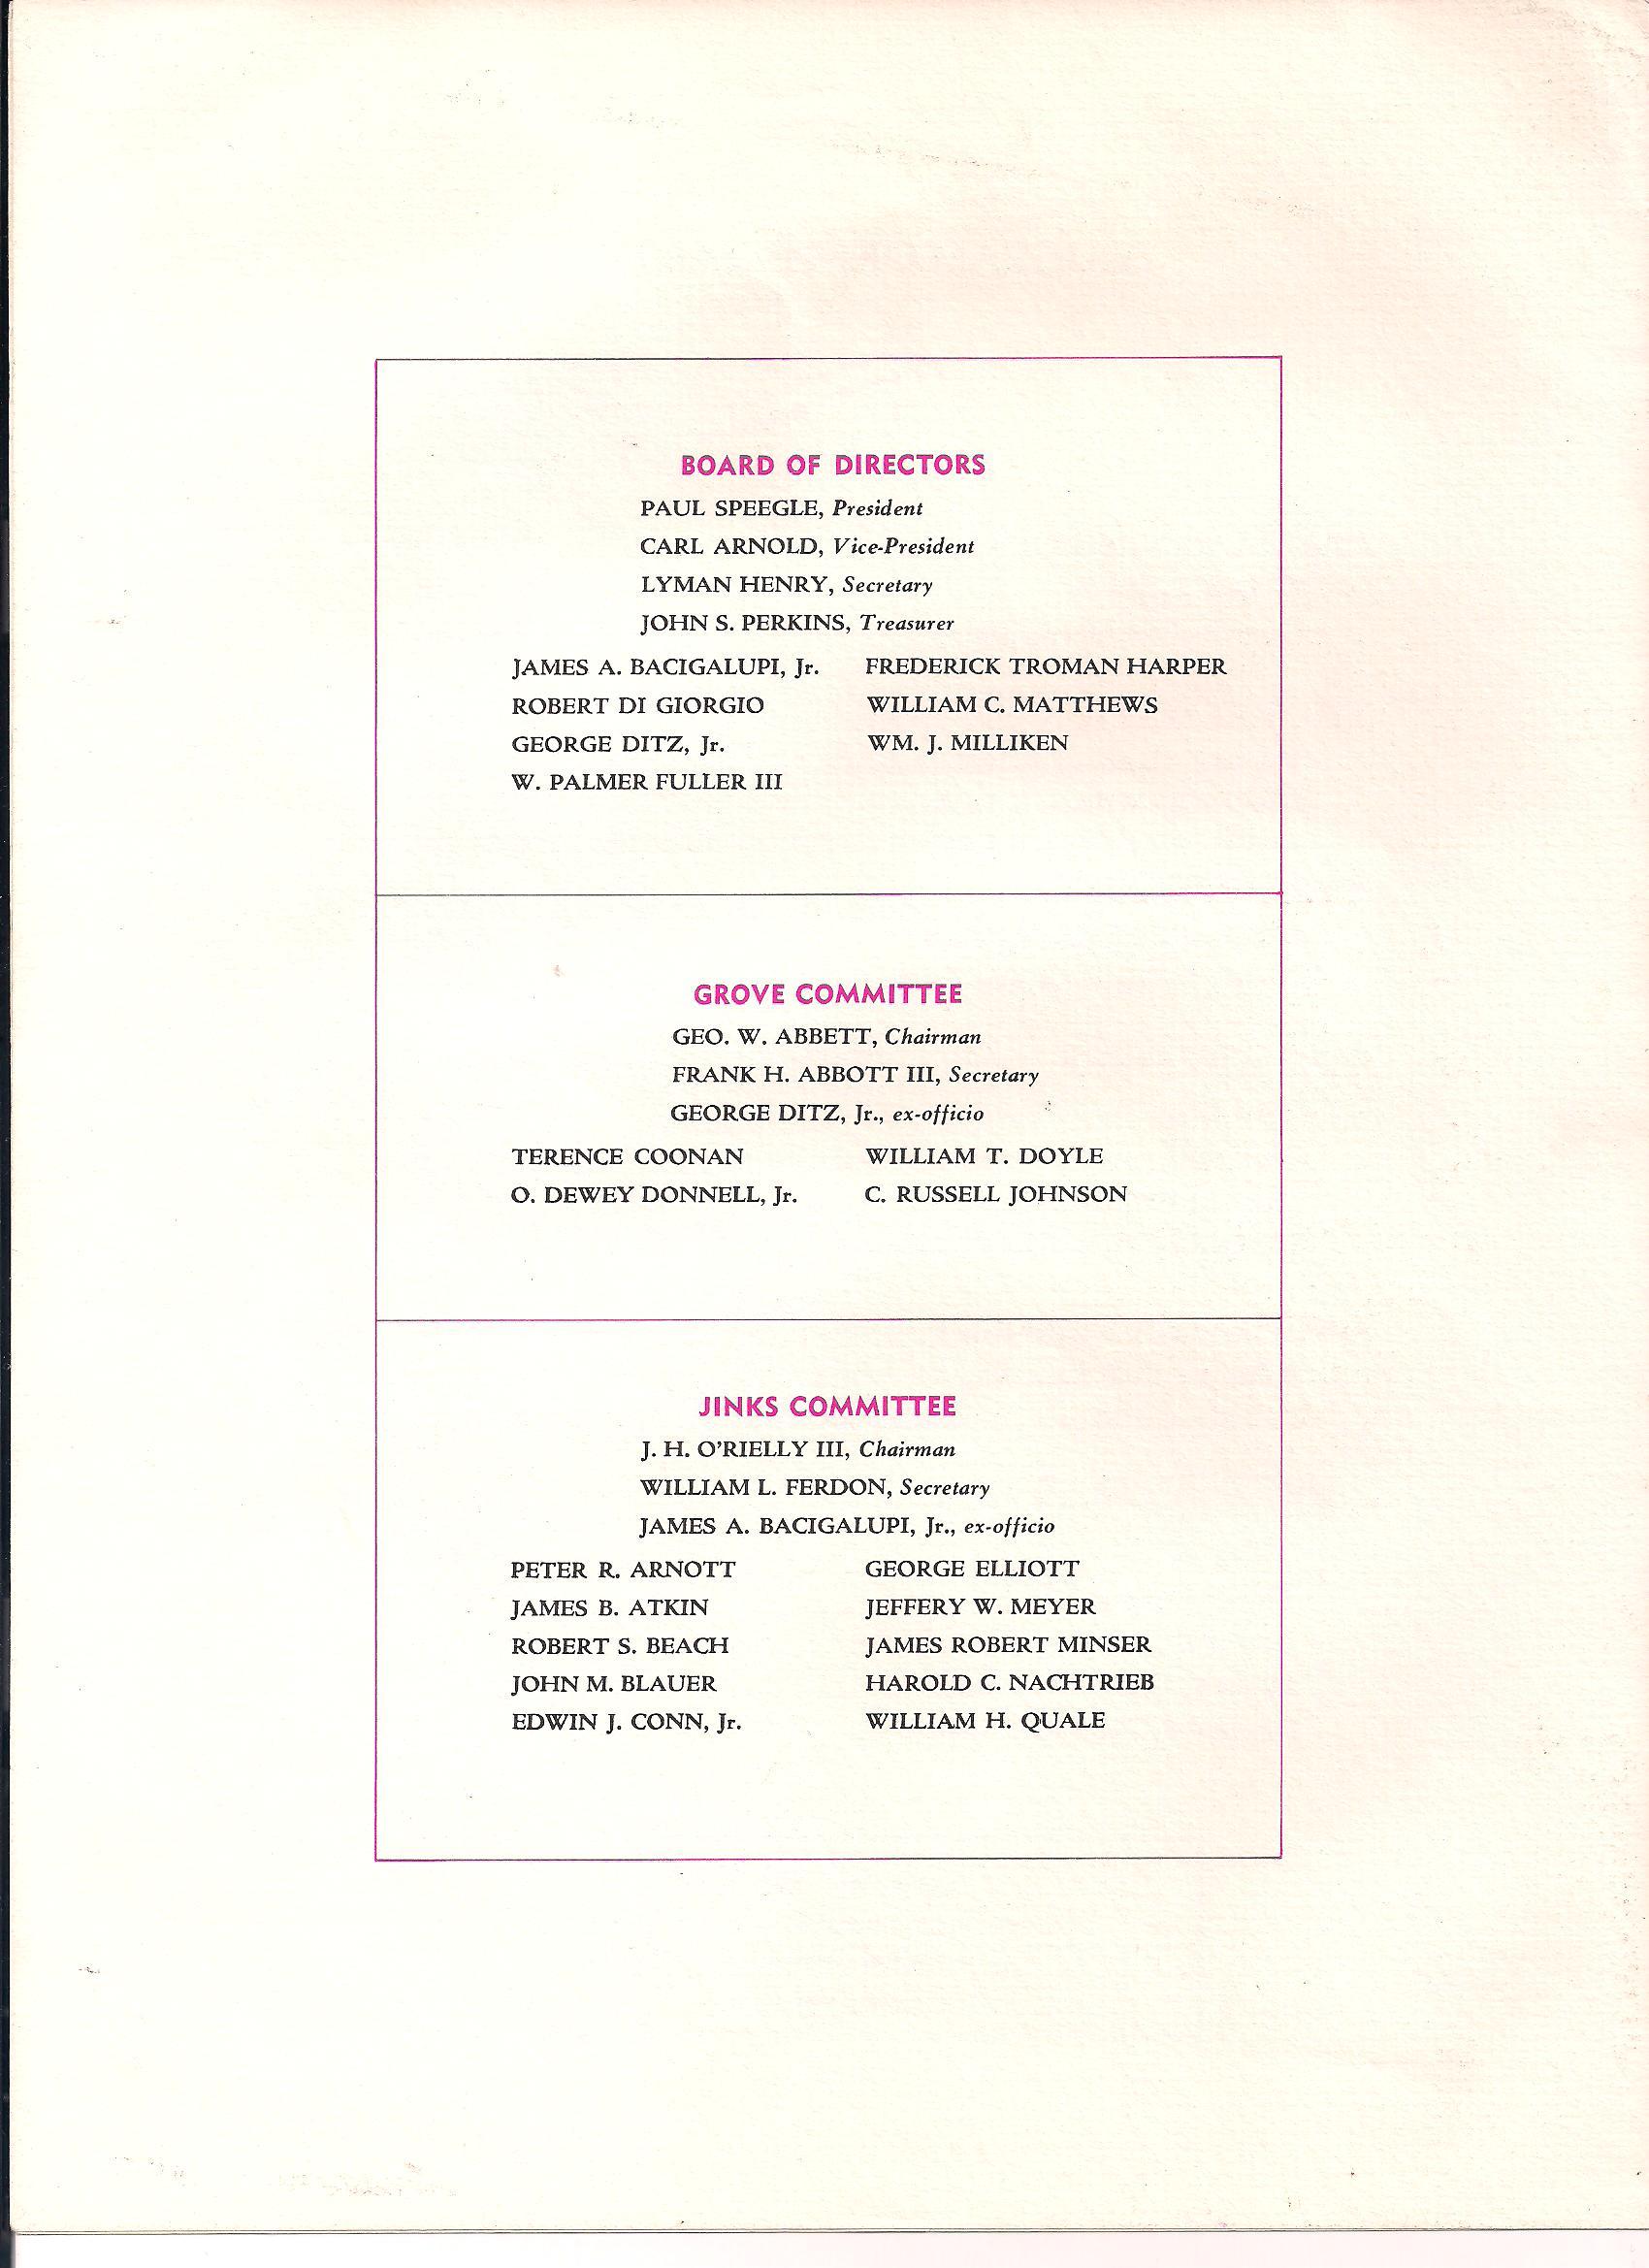 bohemian grove program back page.jpg